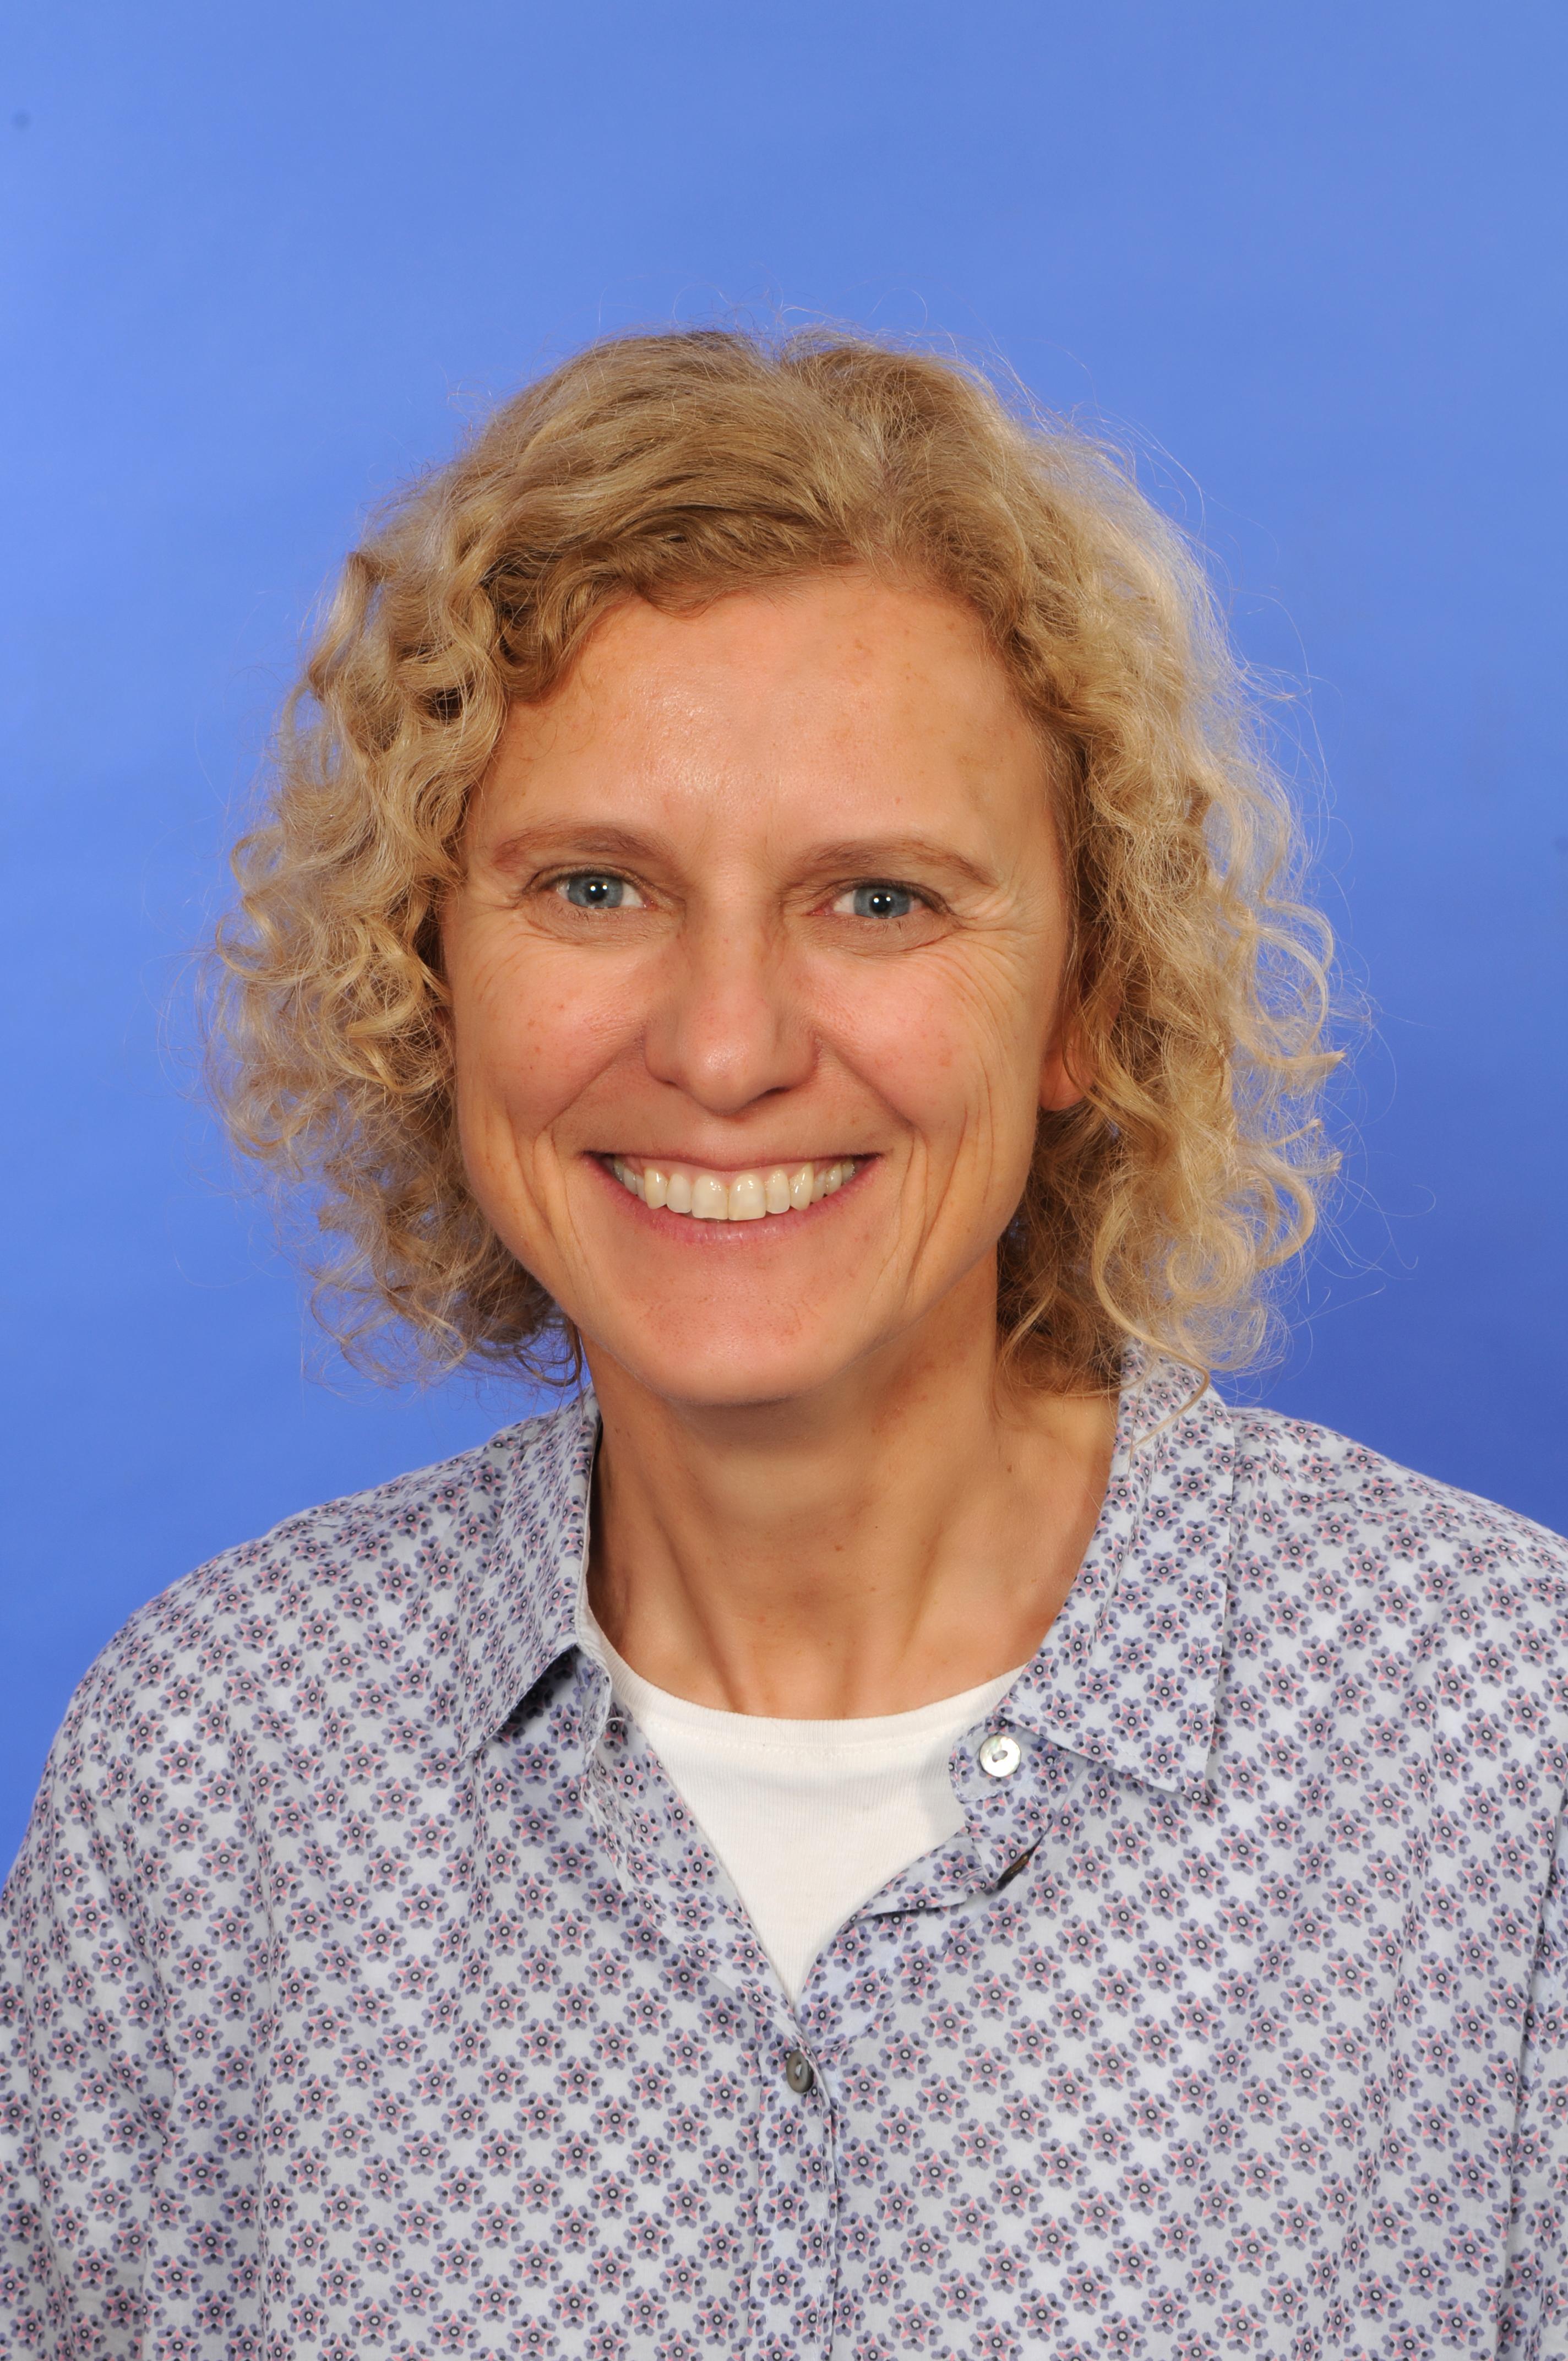 Dr. Cynthia Hog-Angeloni